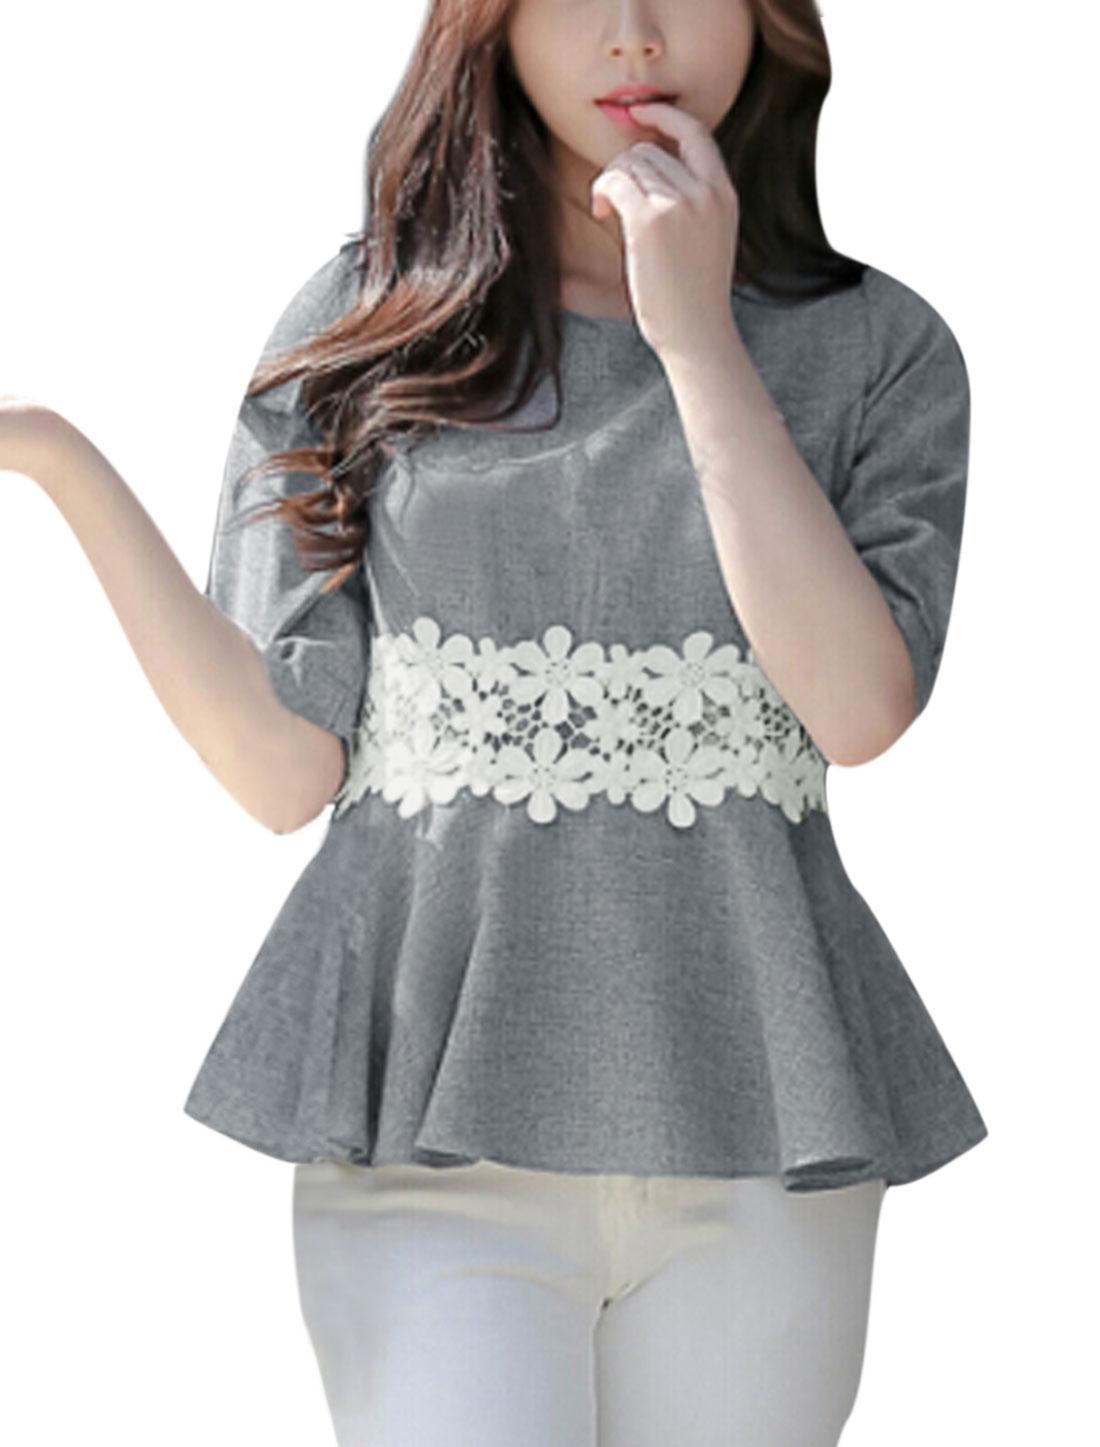 Women Elbow Sleeves Floral Design Peplum Tops Gray XS